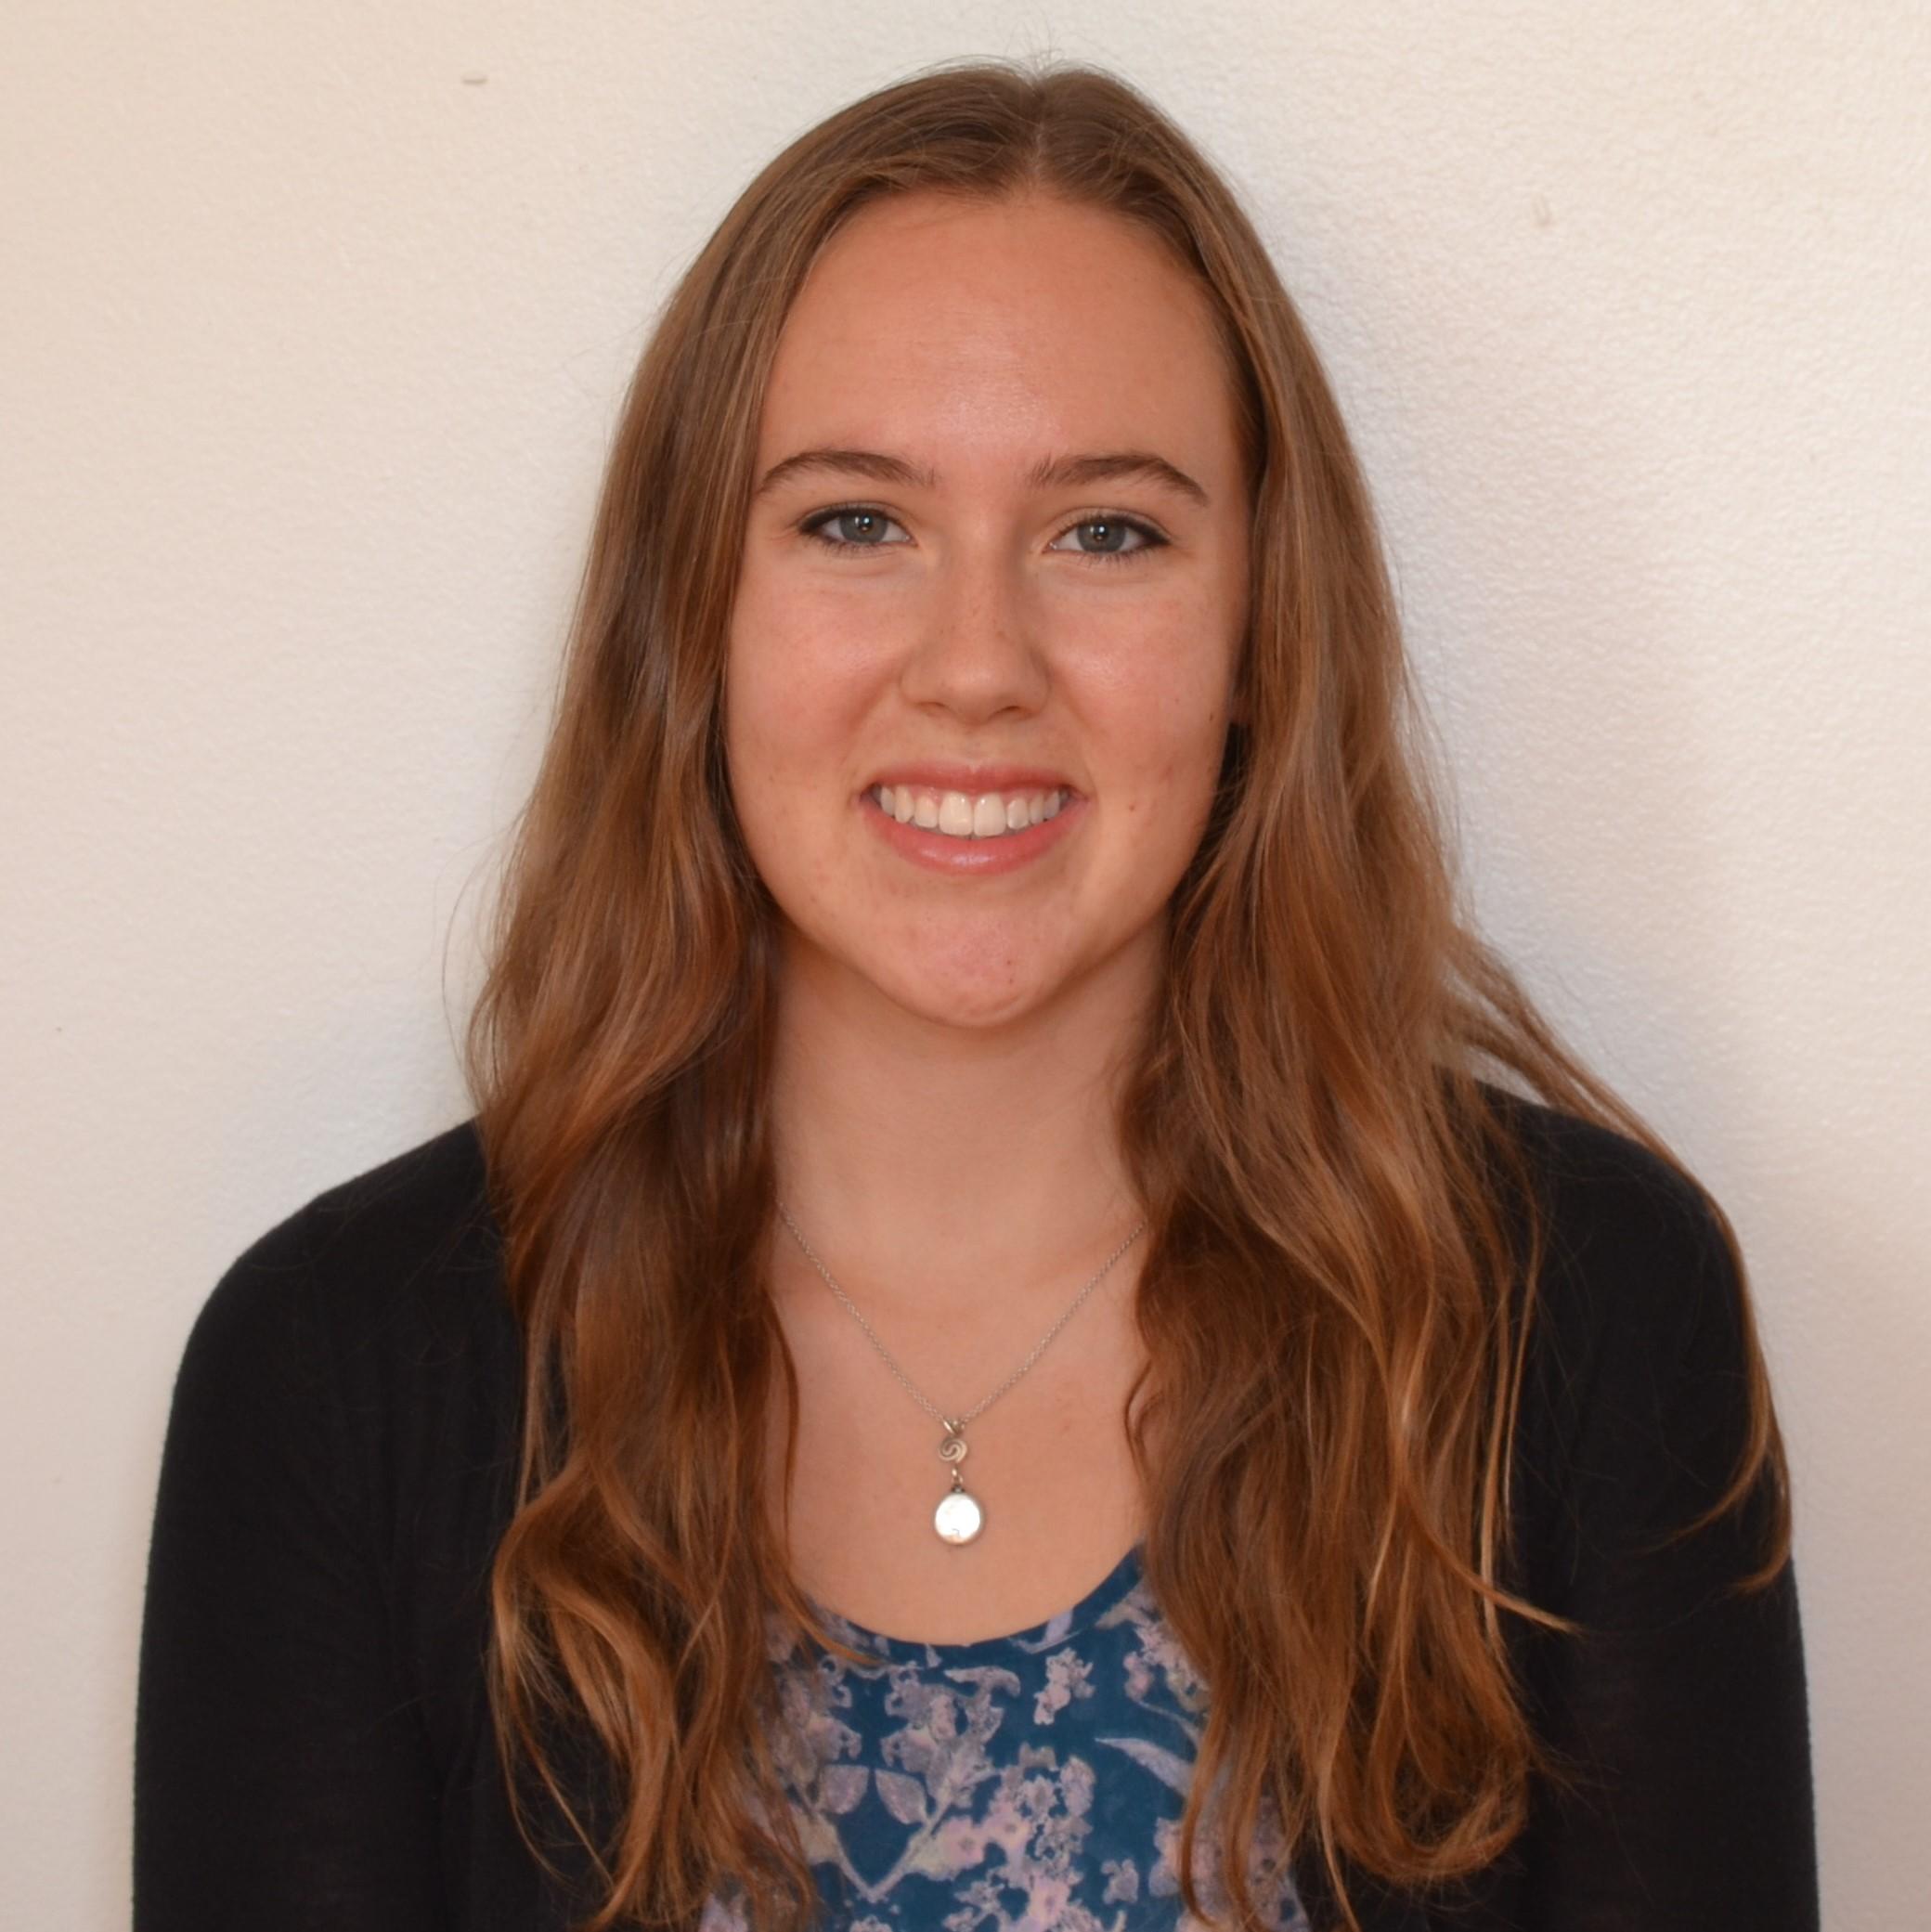 Johanna Rayl - Class of 2018Background: BA Environmental Analysis (Pomona)Placement: PhD Economics, ChicagoNSF Awardee